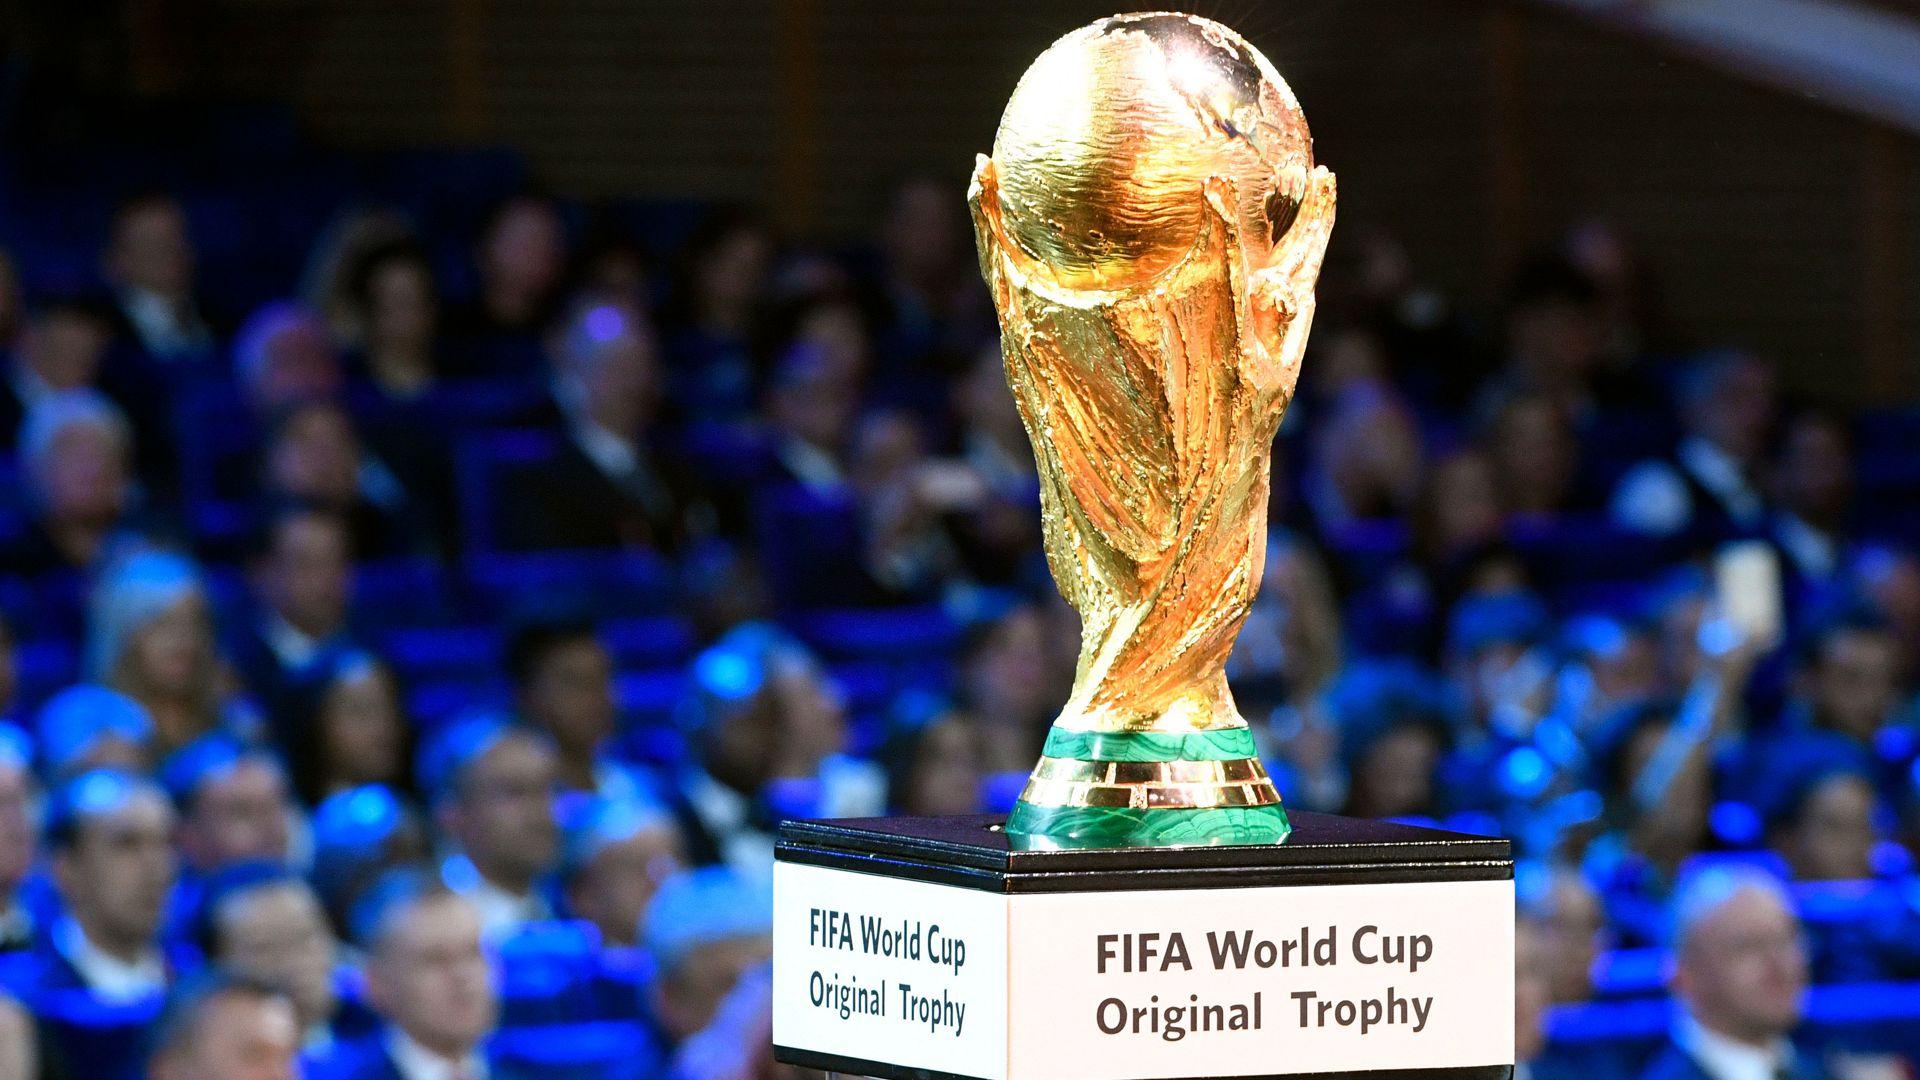 Image result for เกมอีโมจิทายชื่อแข้งบอลโลกระบาดโซเชียล